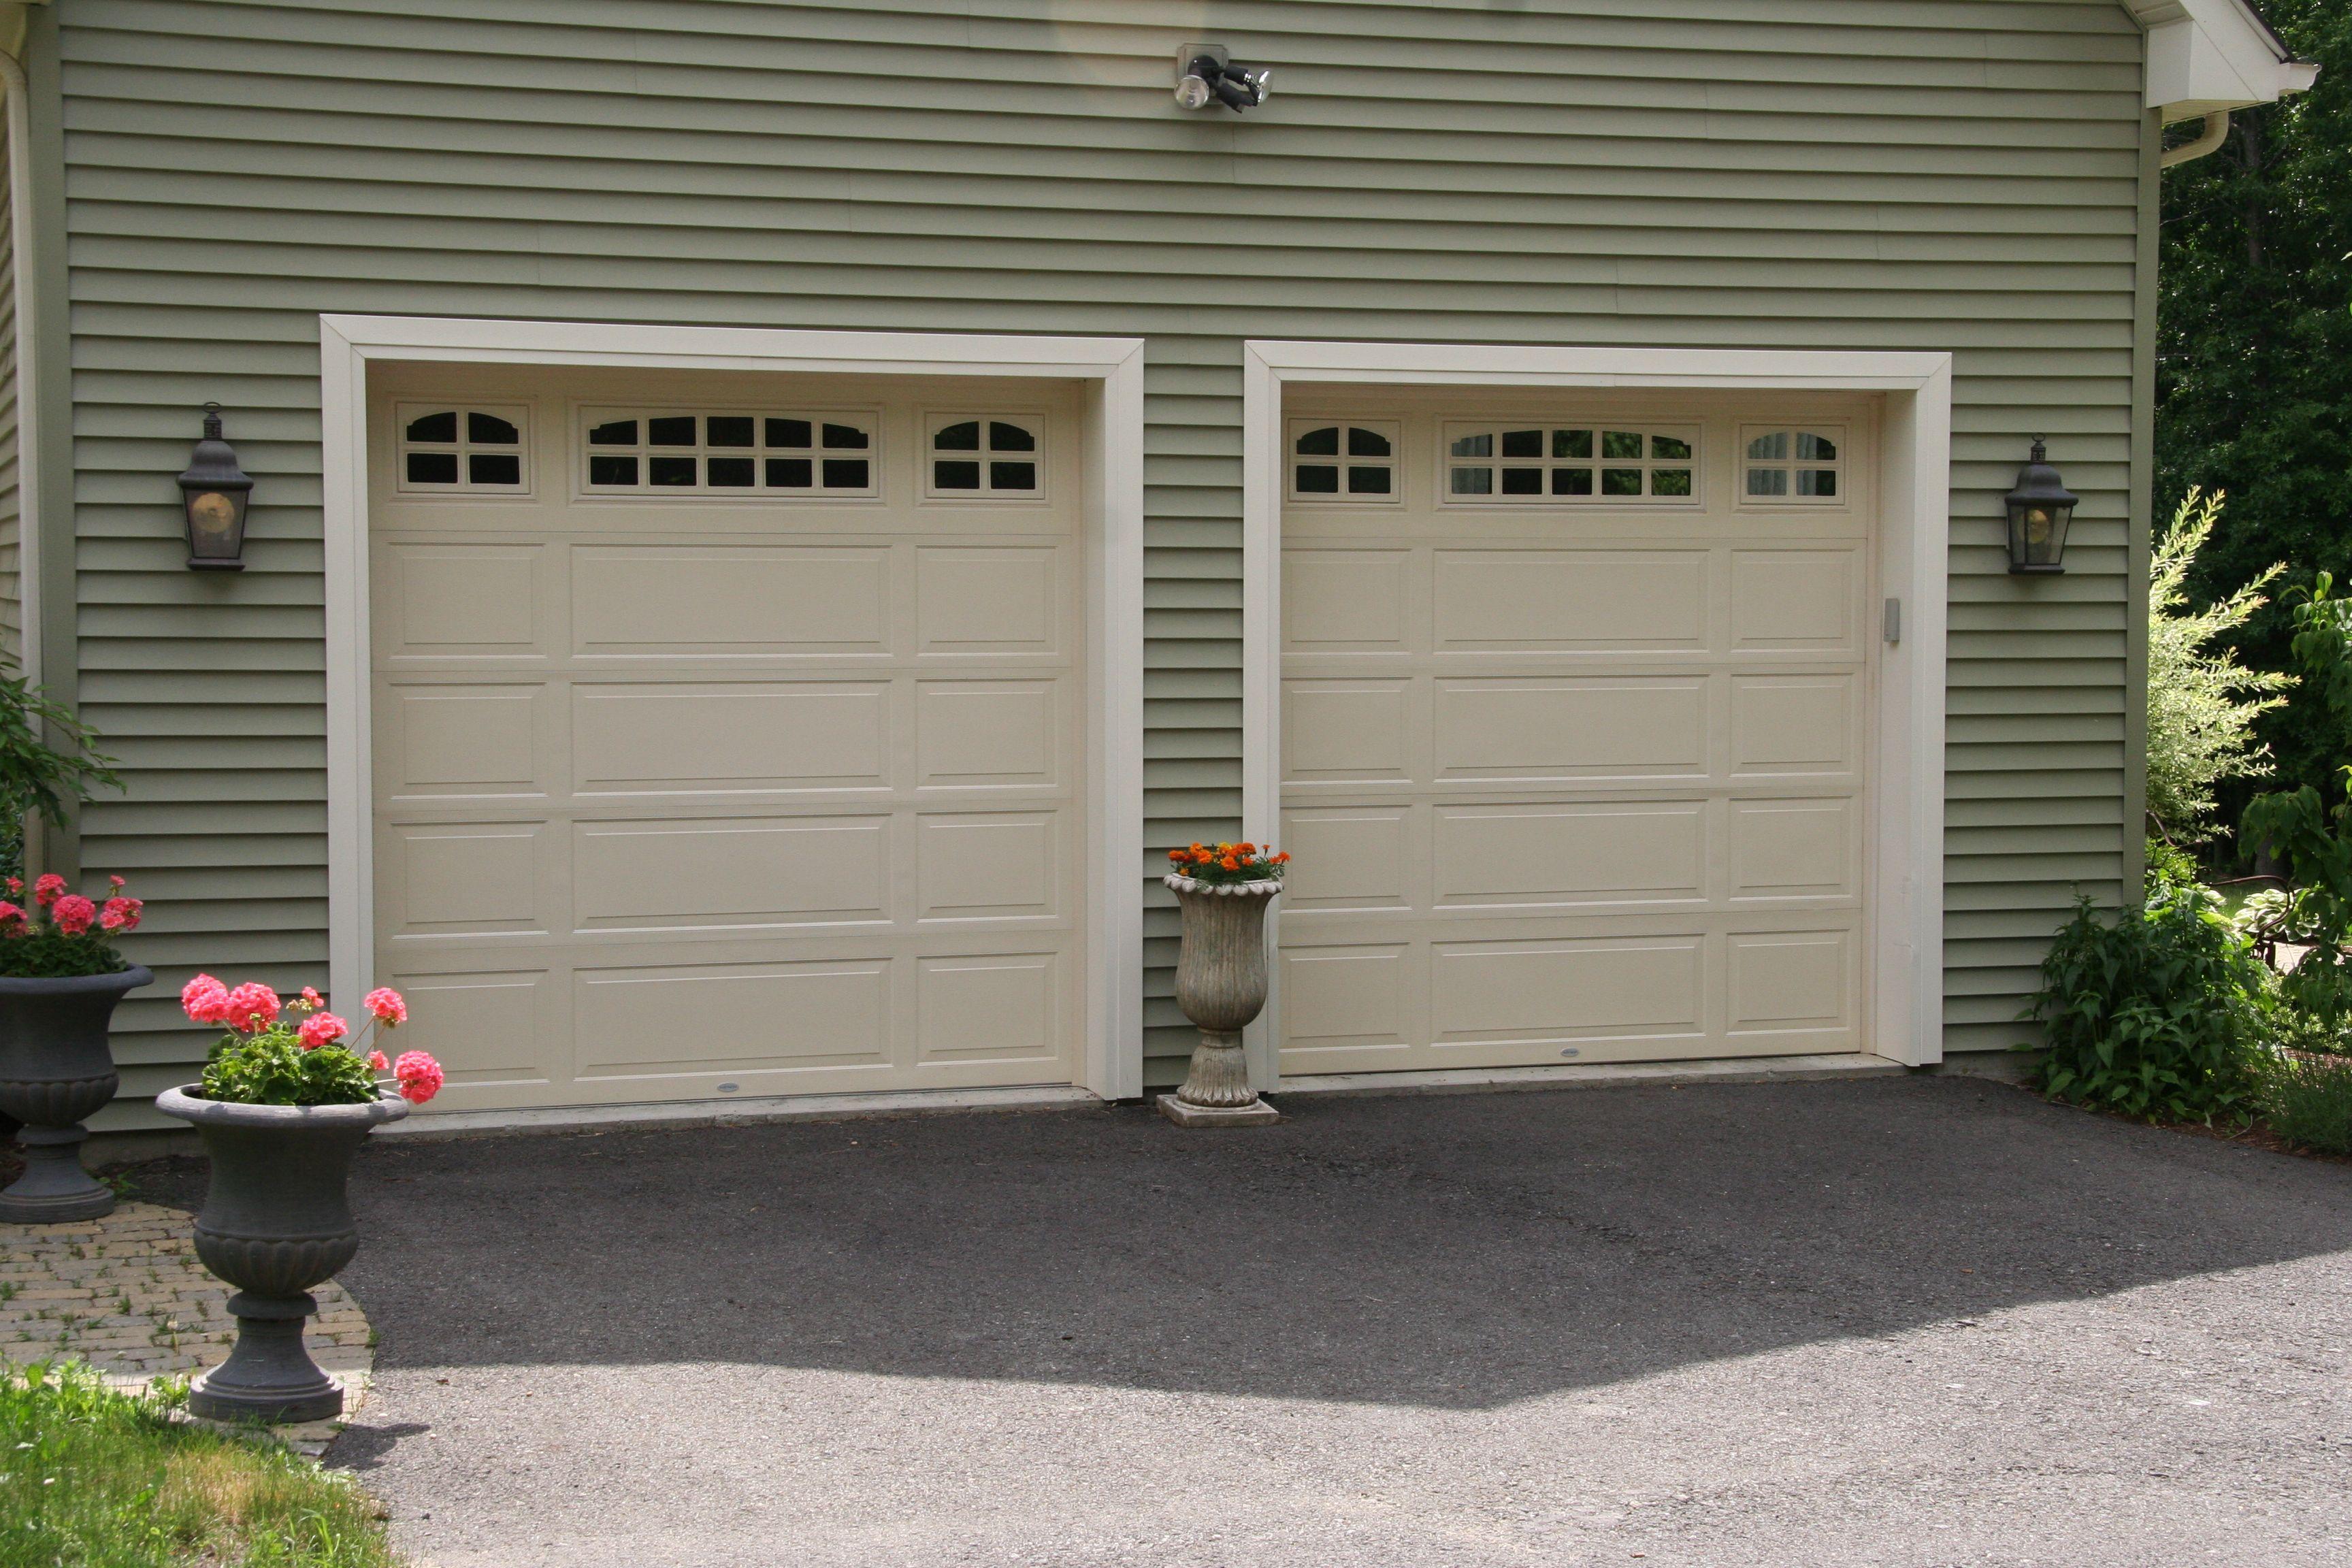 High Quality Raynor Garage Doors Centura Millcreek Panel Design Claytone Dutchess  Overhead Doors, Inc.